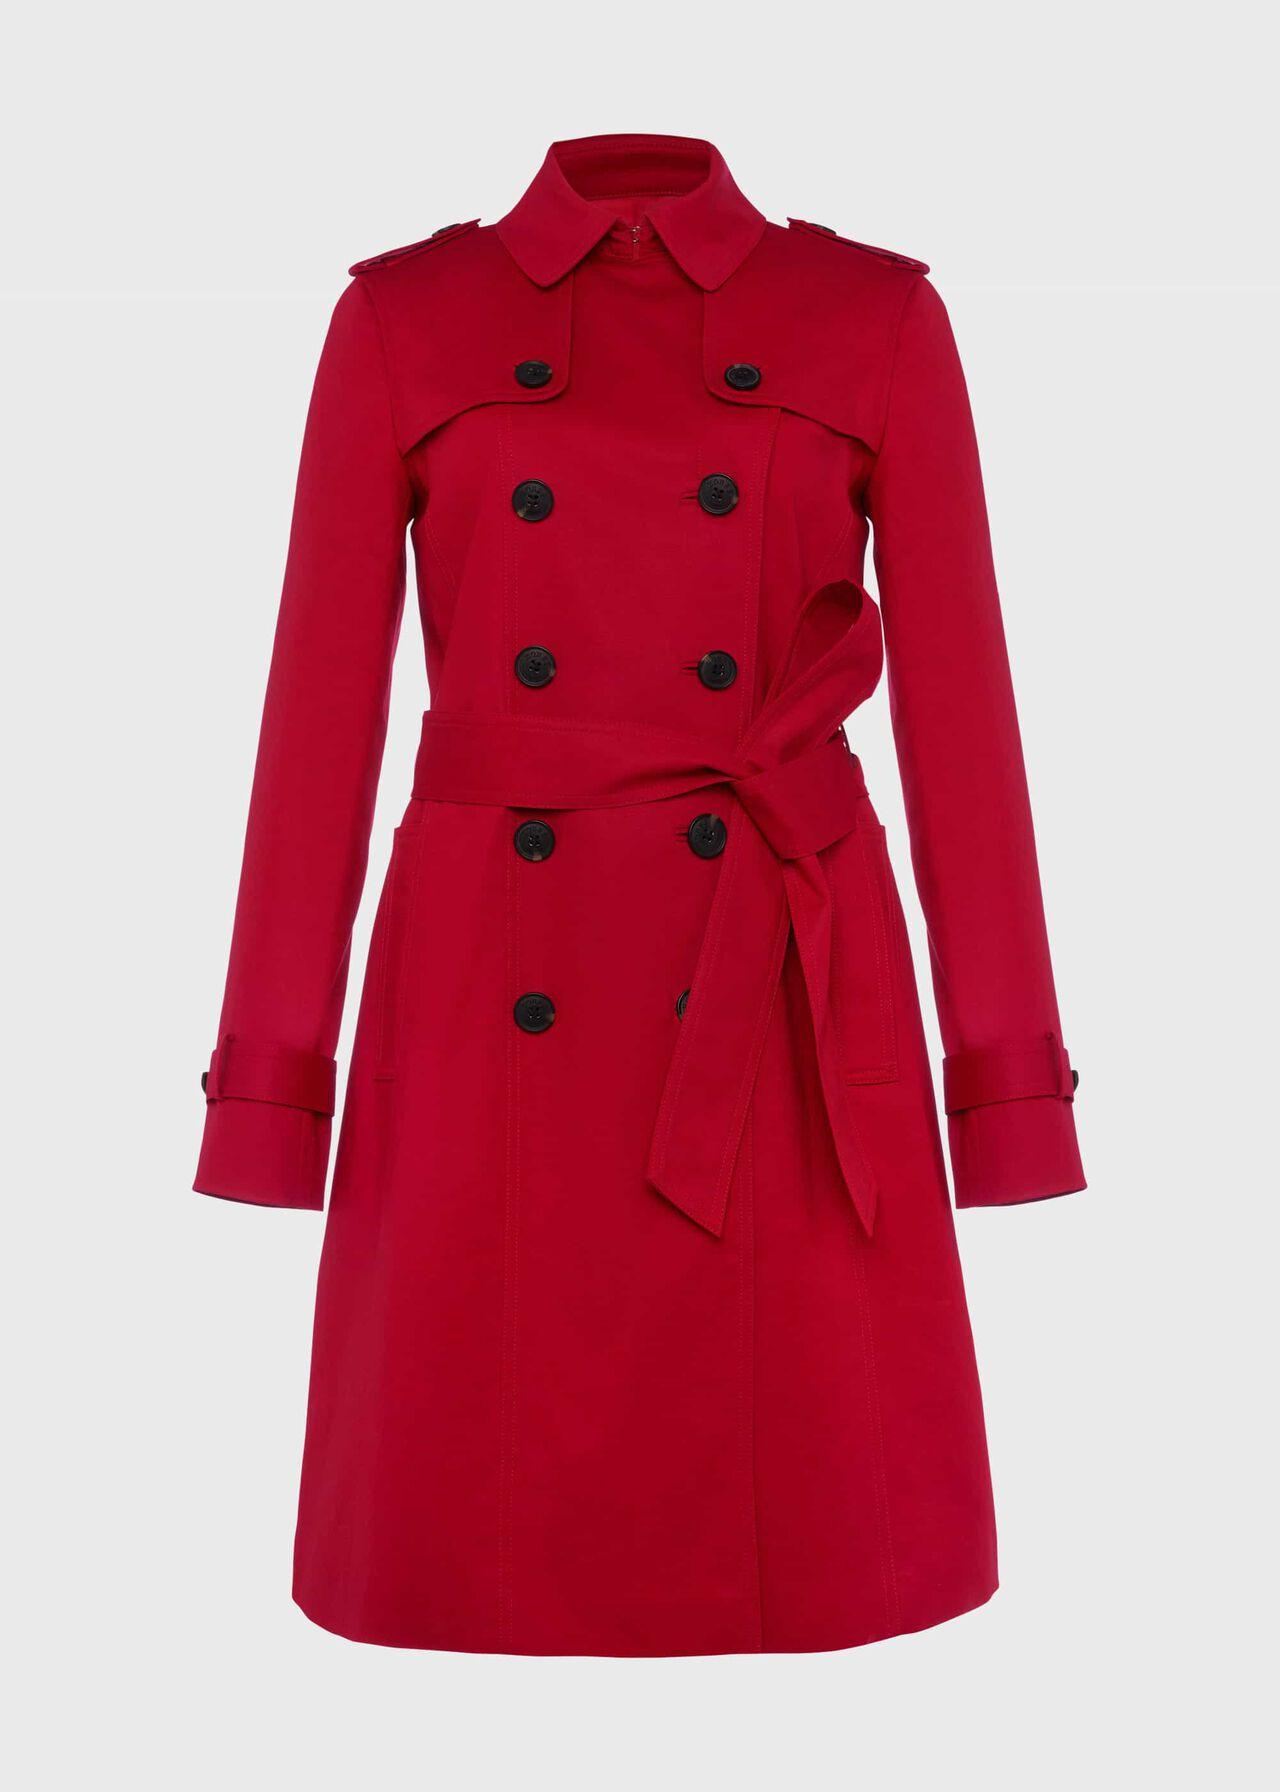 Saskia Water Resistant Trench Coat Red